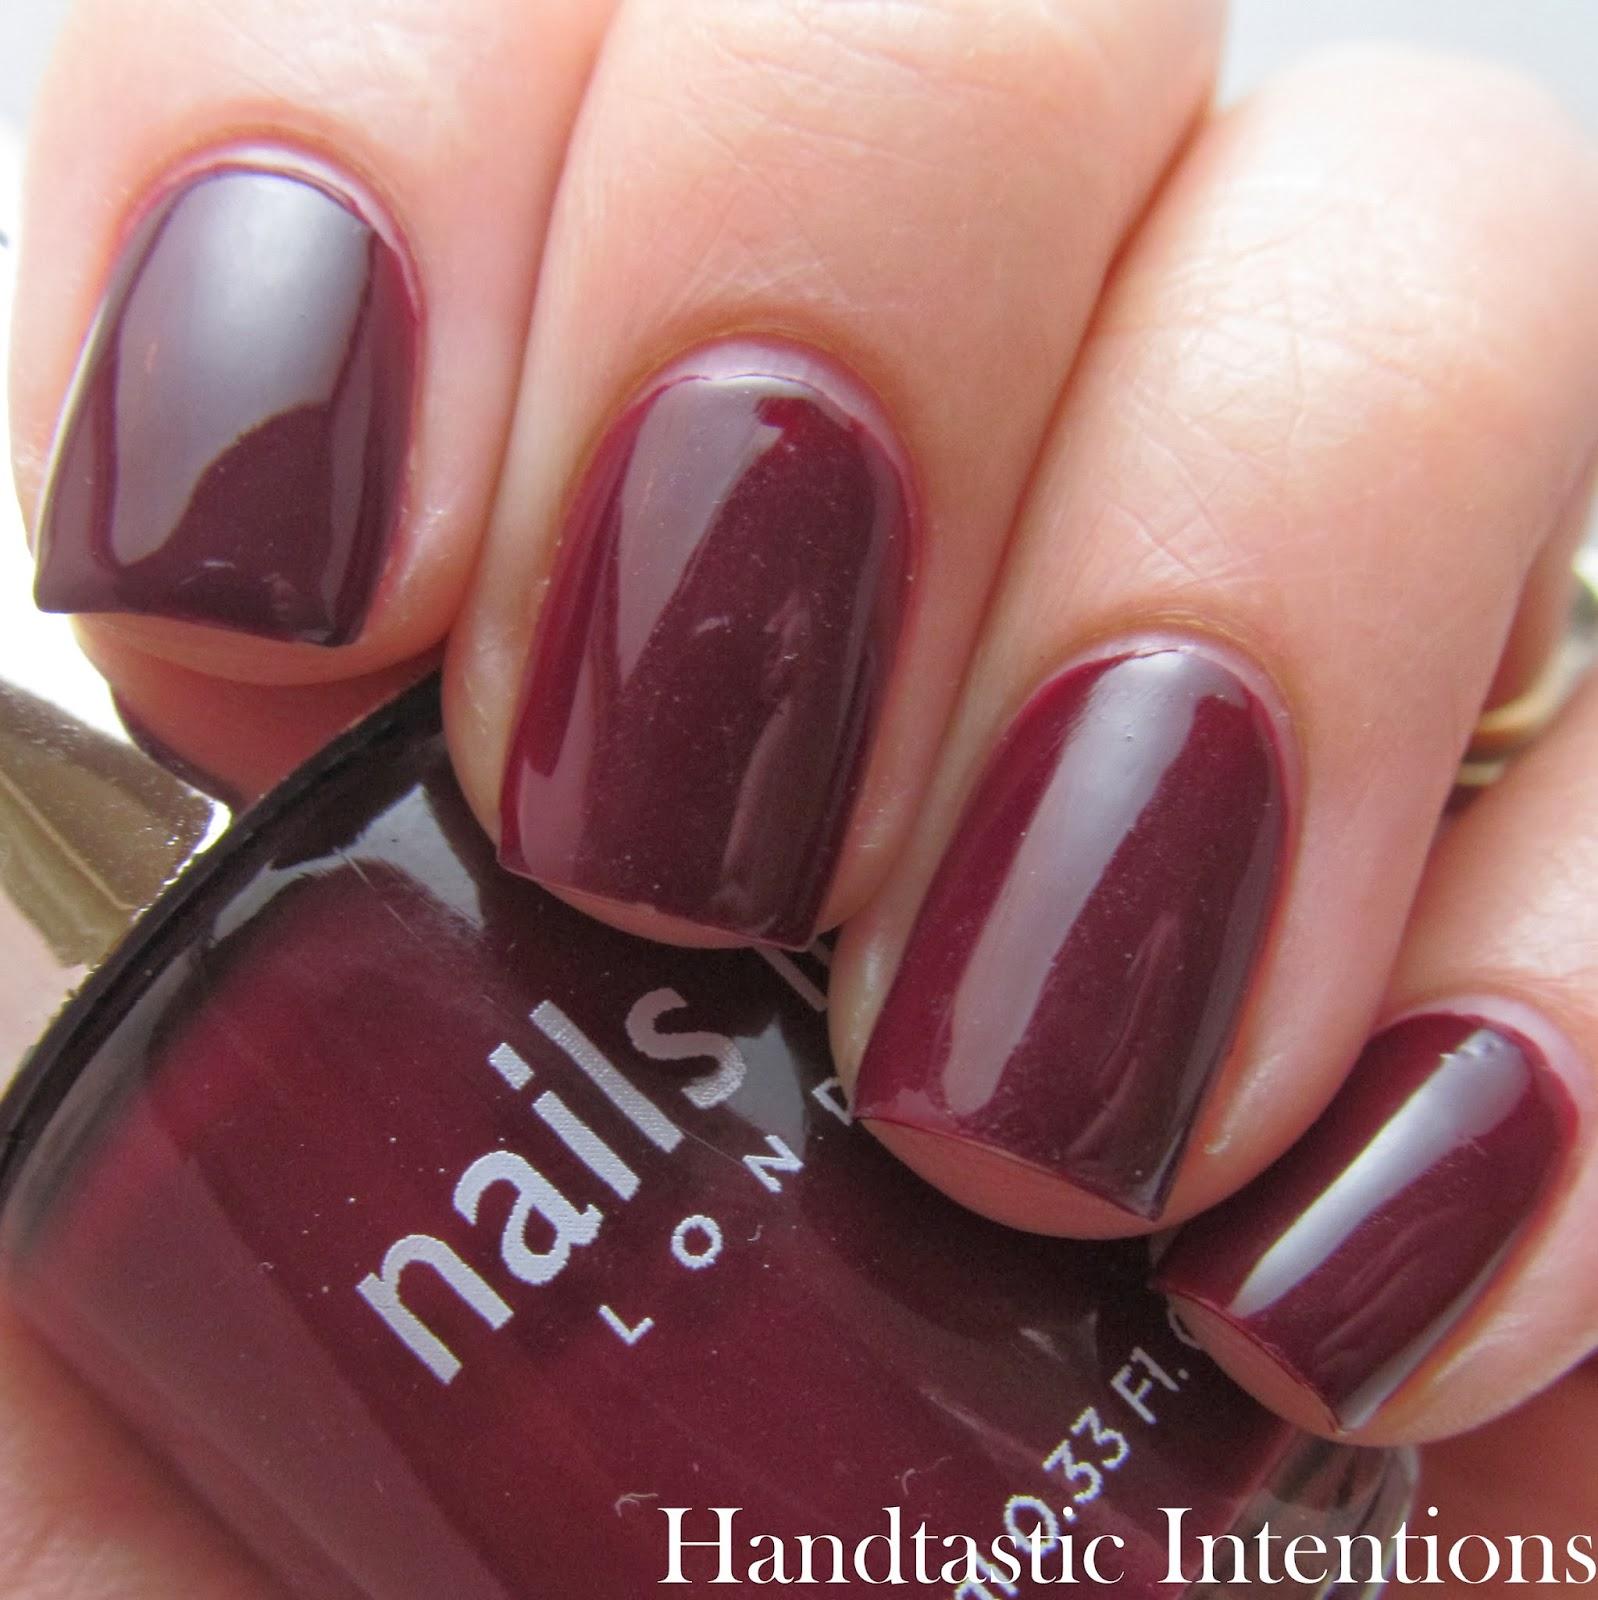 Nail Polish Nails Inc Sephora Handtastic Intentions Swatch